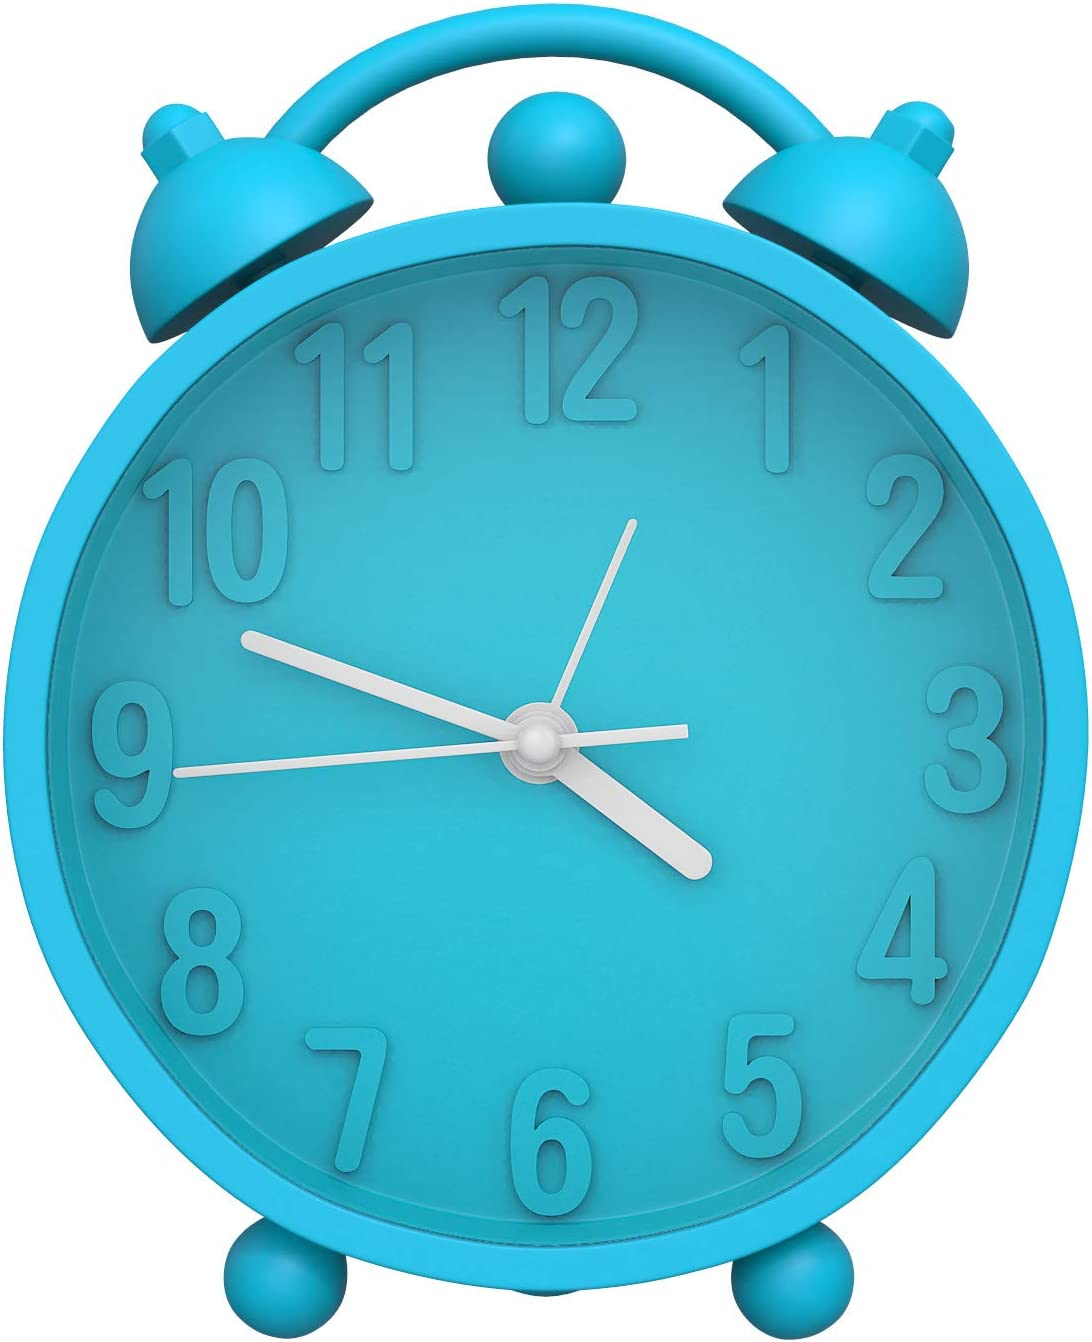 MoKo Despertador de Doble Campana, Alarma Digital Clásicos de Silicona Suave de Escritorio, Alimentado por Batería(No Incluido) - Azul